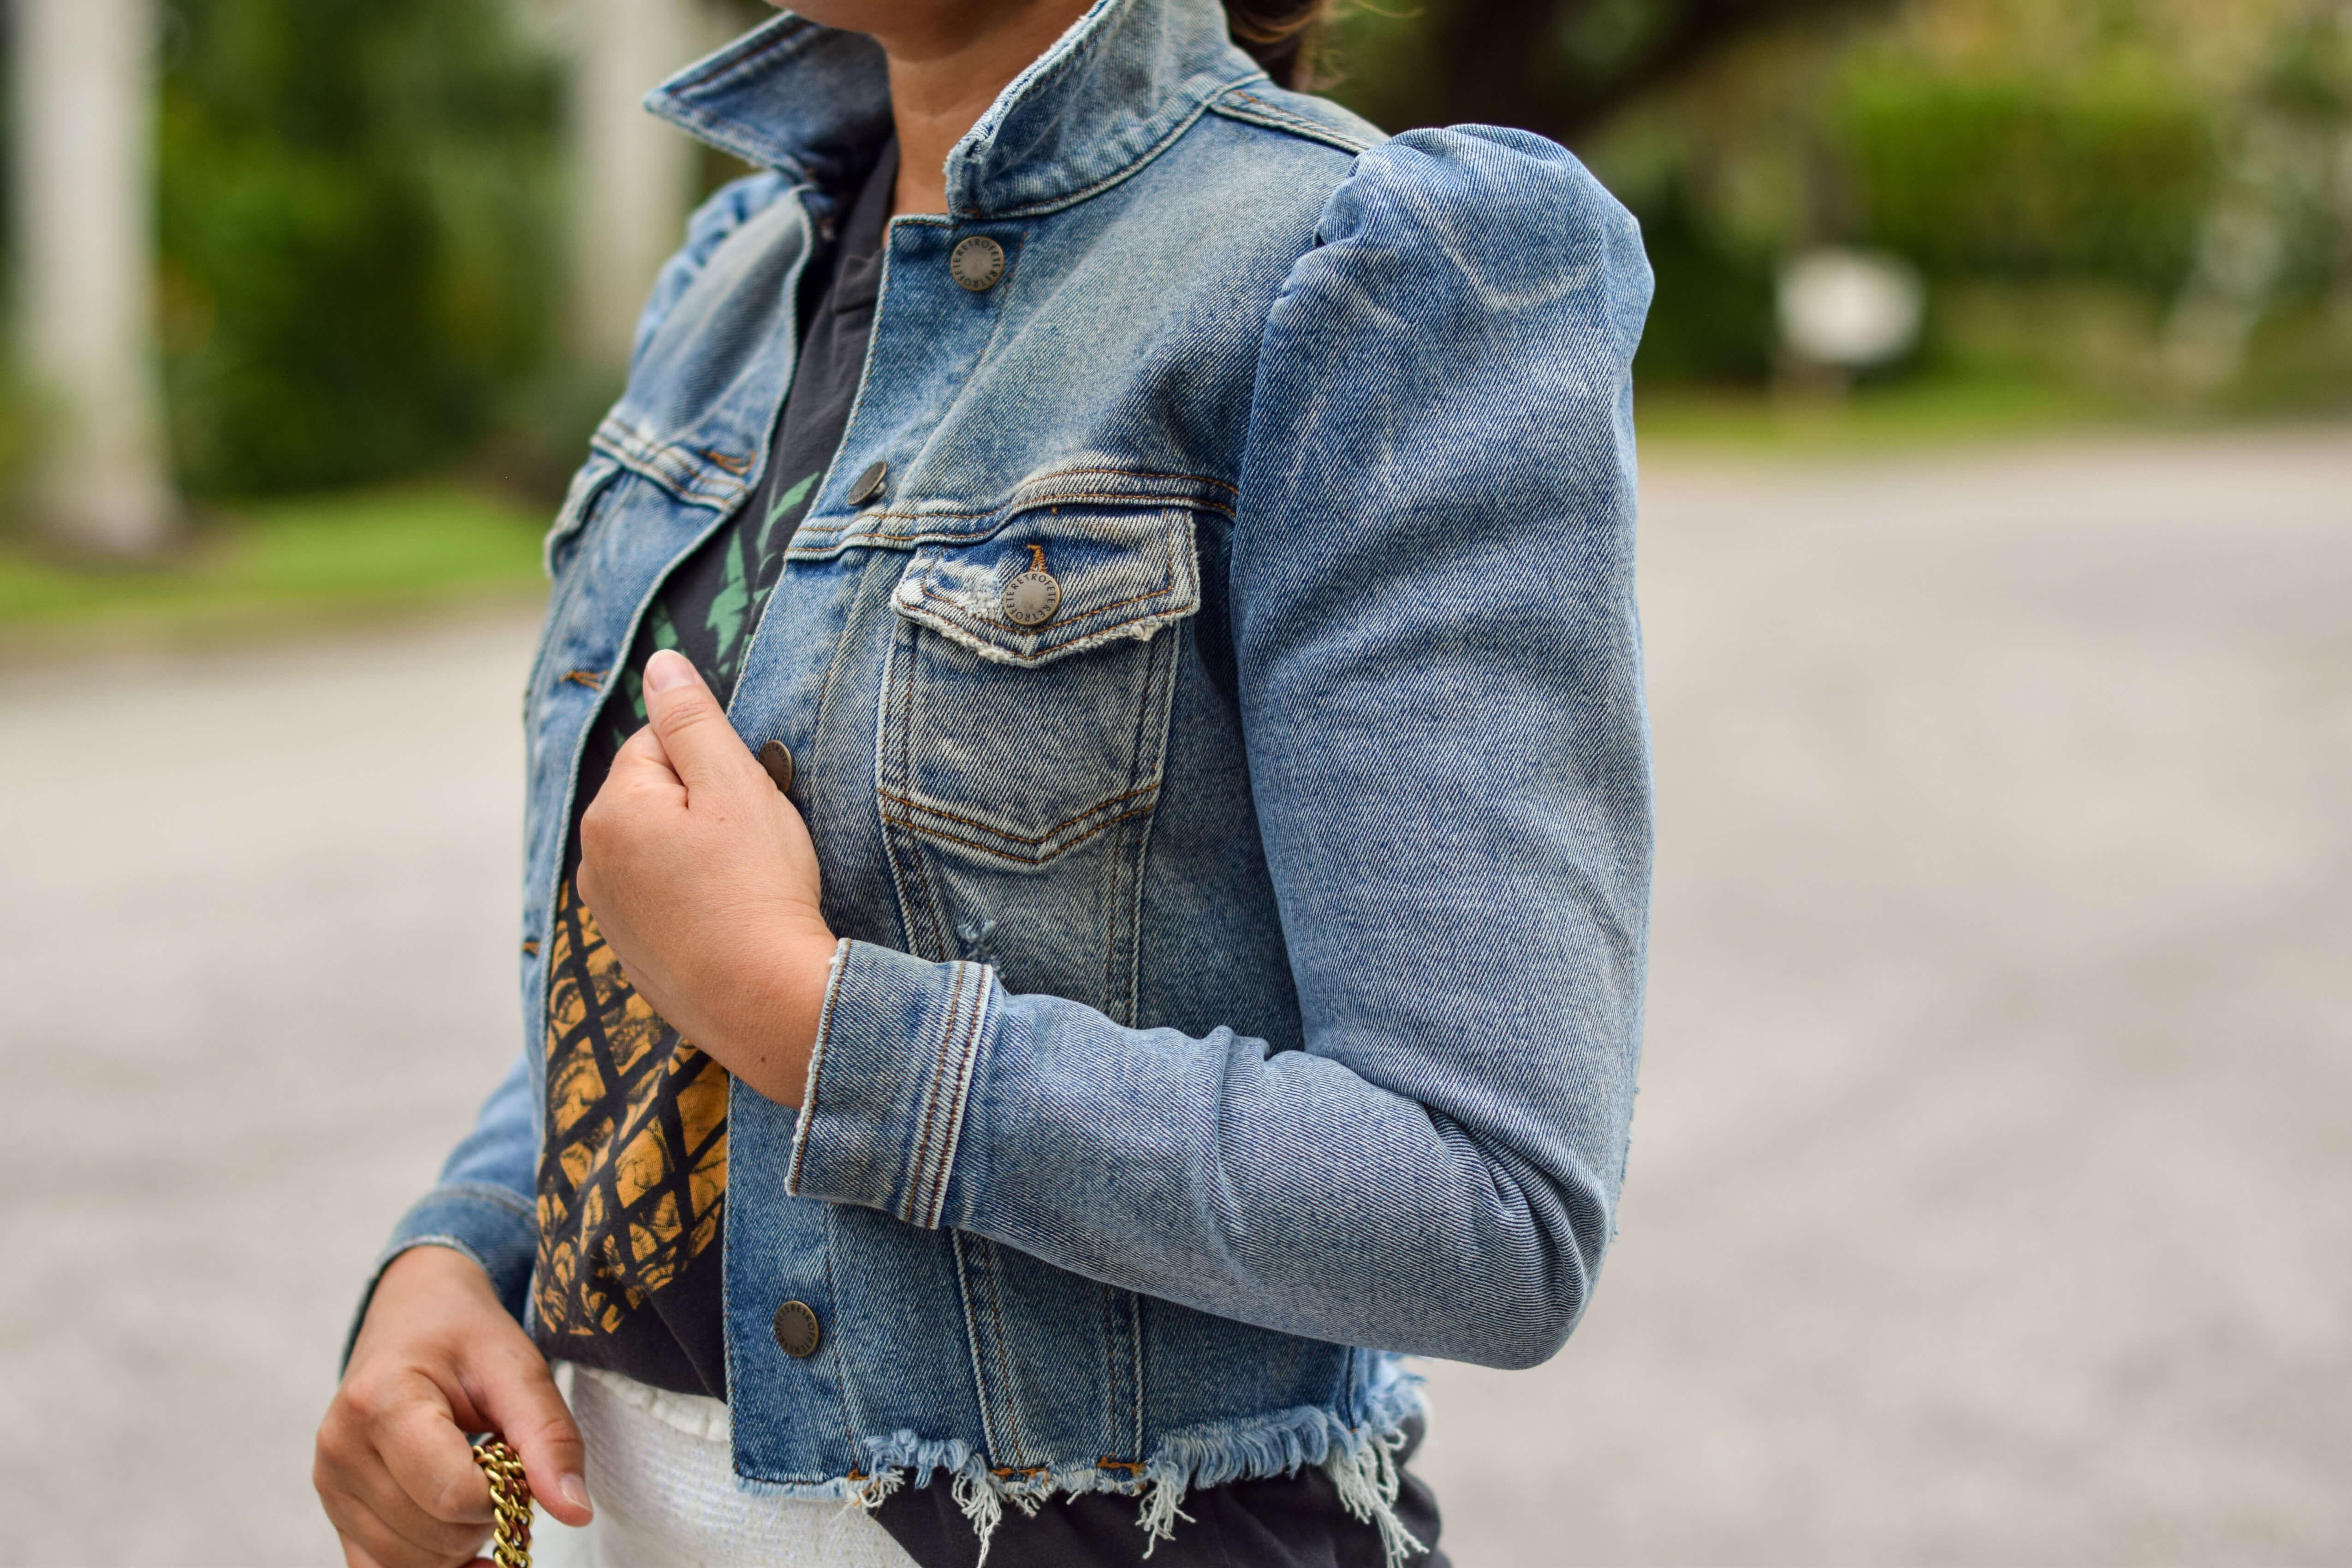 Loveshackfancy Skirt Italeau Booties Retrofete Jacket Anthro Tee Outfit by Modnitsa Styling